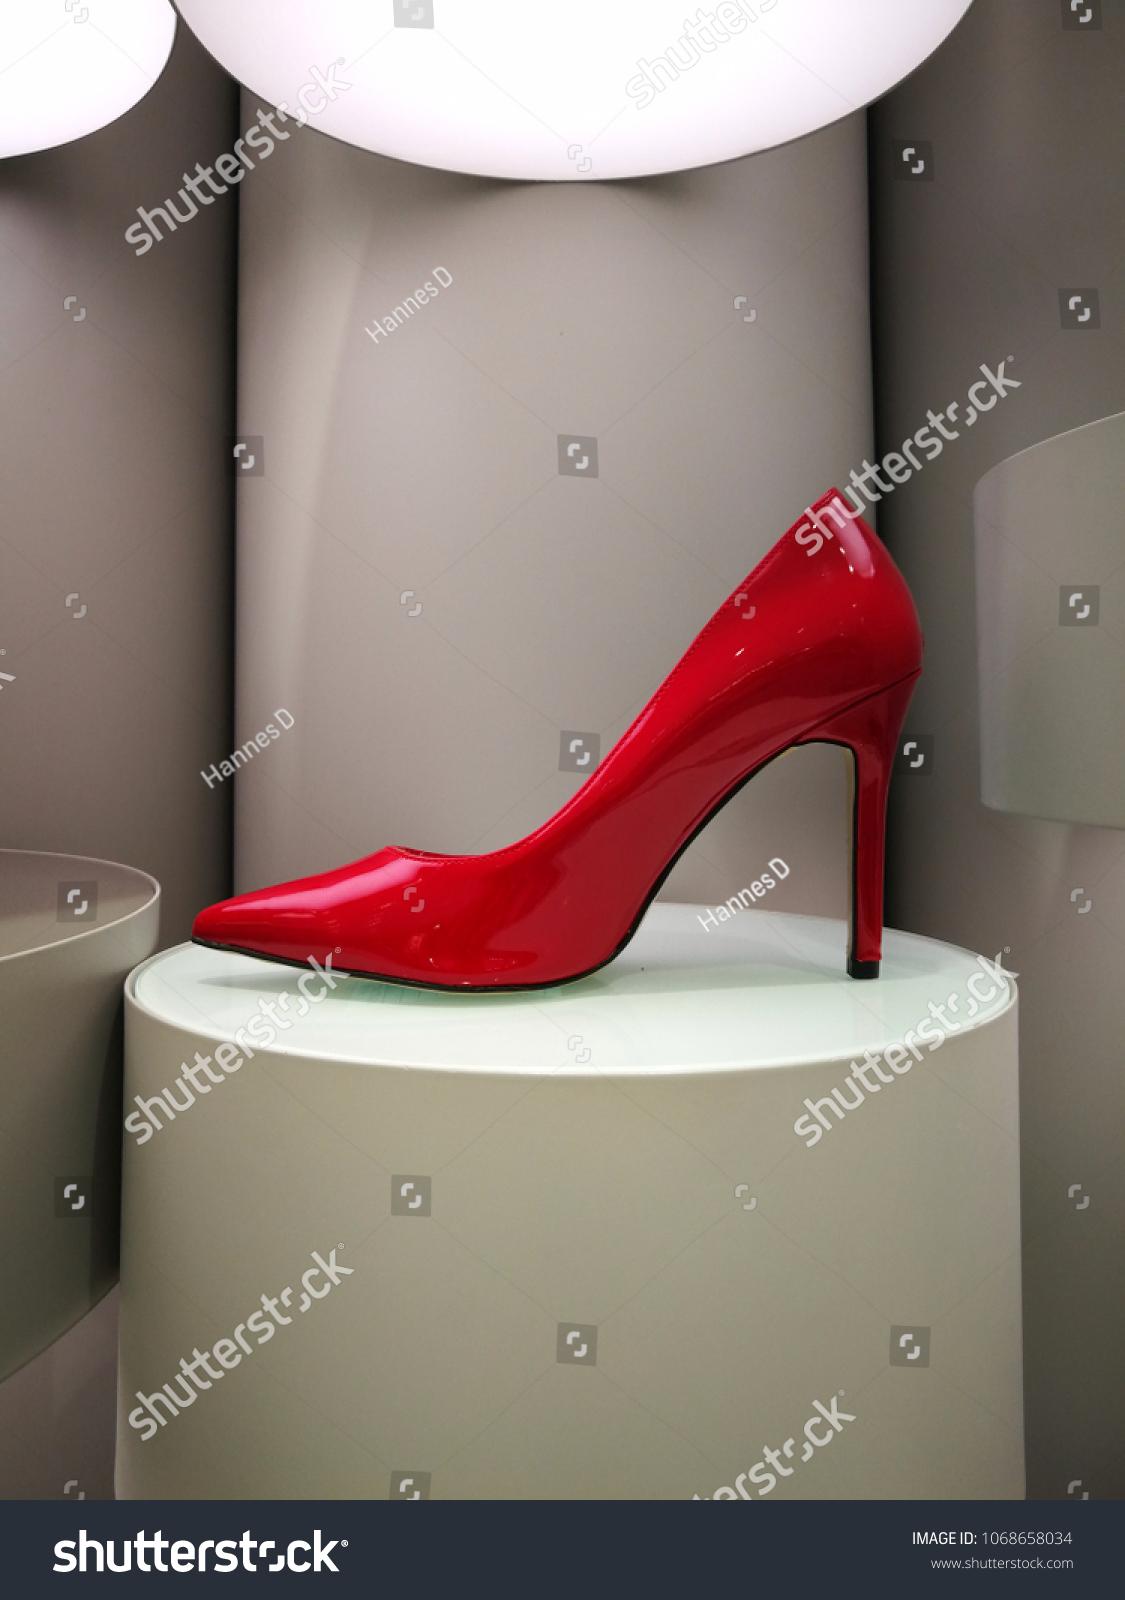 Sensual Glossy High Heel On Retro Stock Photo Edit Now 1068658034 Heels Display